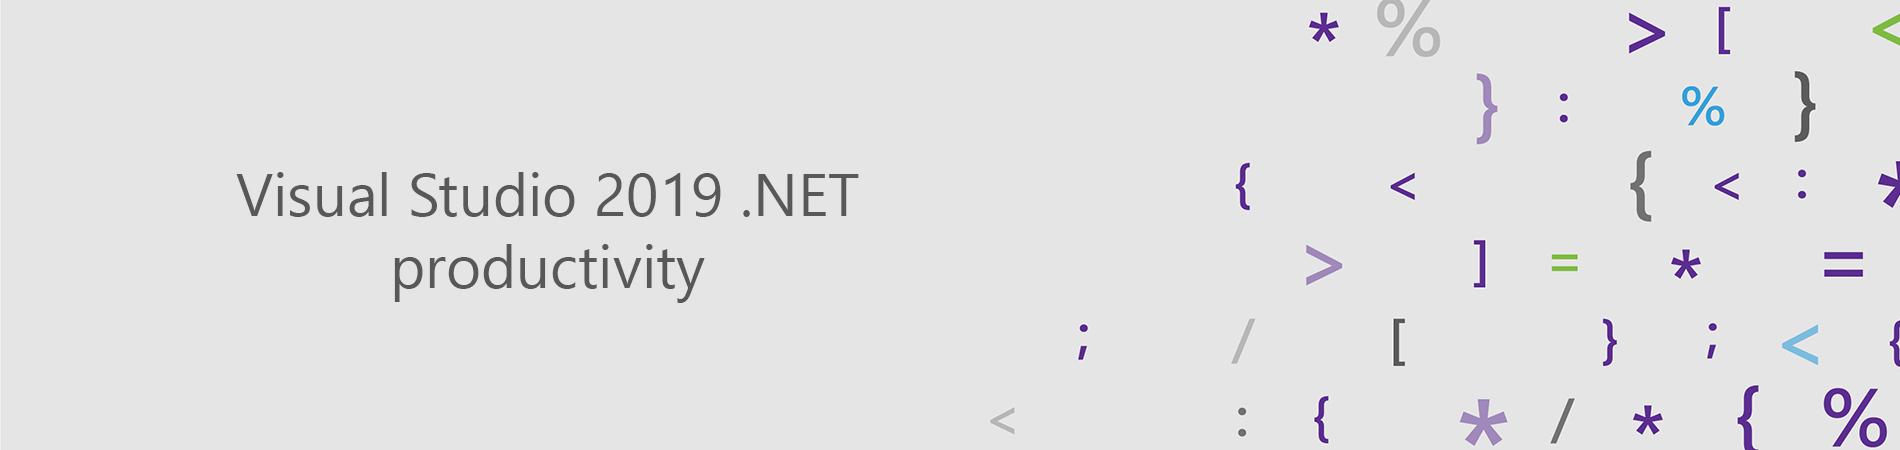 Visual Studio 2019  NET productivity / Microsoft corporate blog / Habr